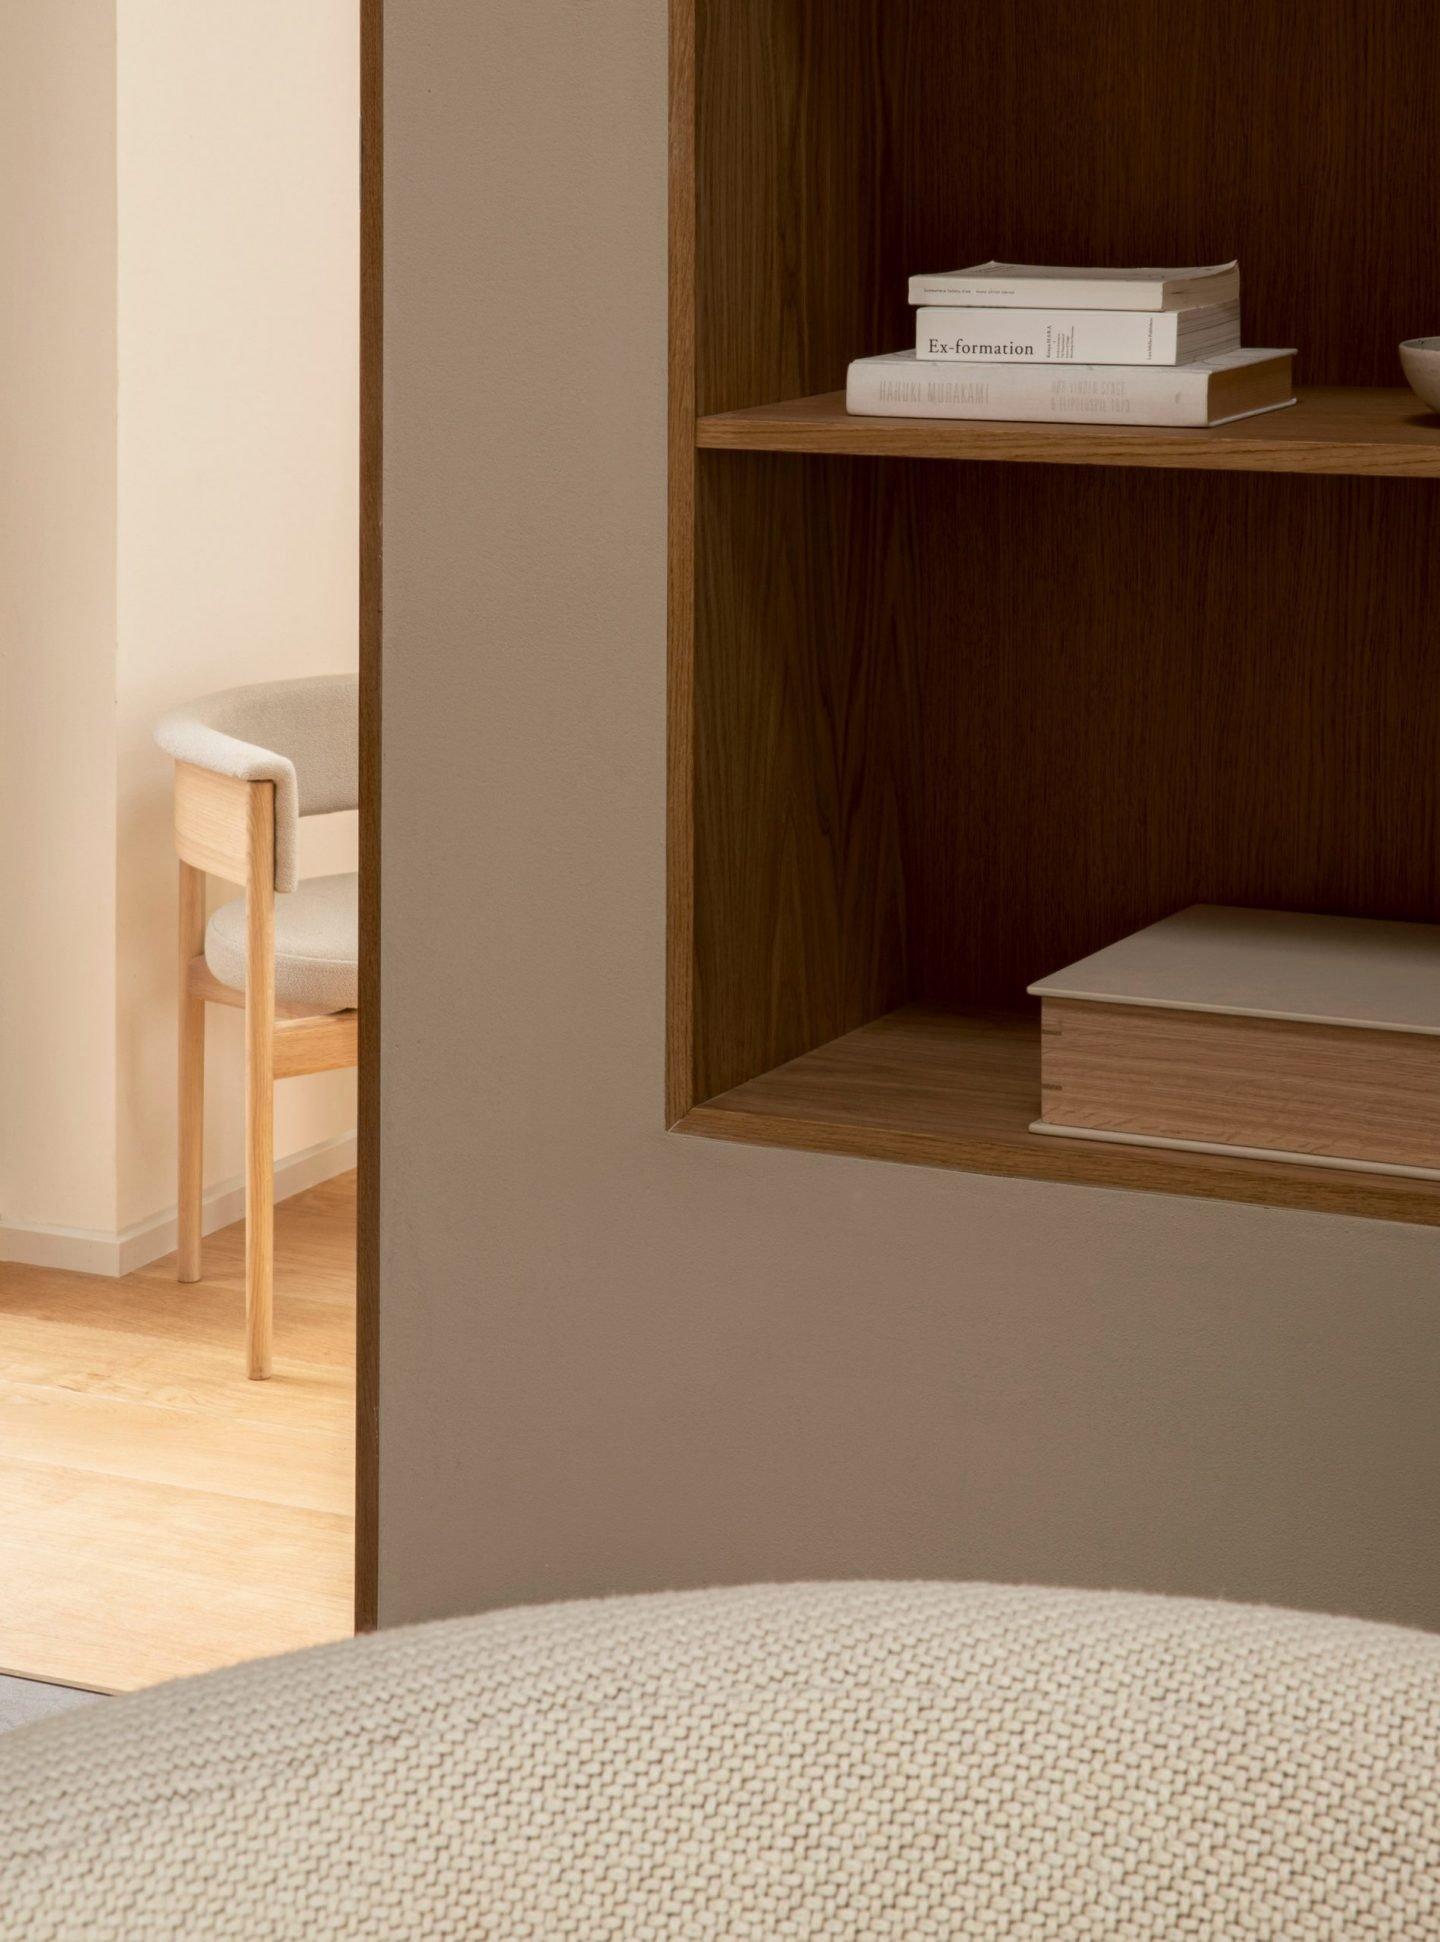 IGNANT-Architecture-Norm-Architects-Archipelago-House-010